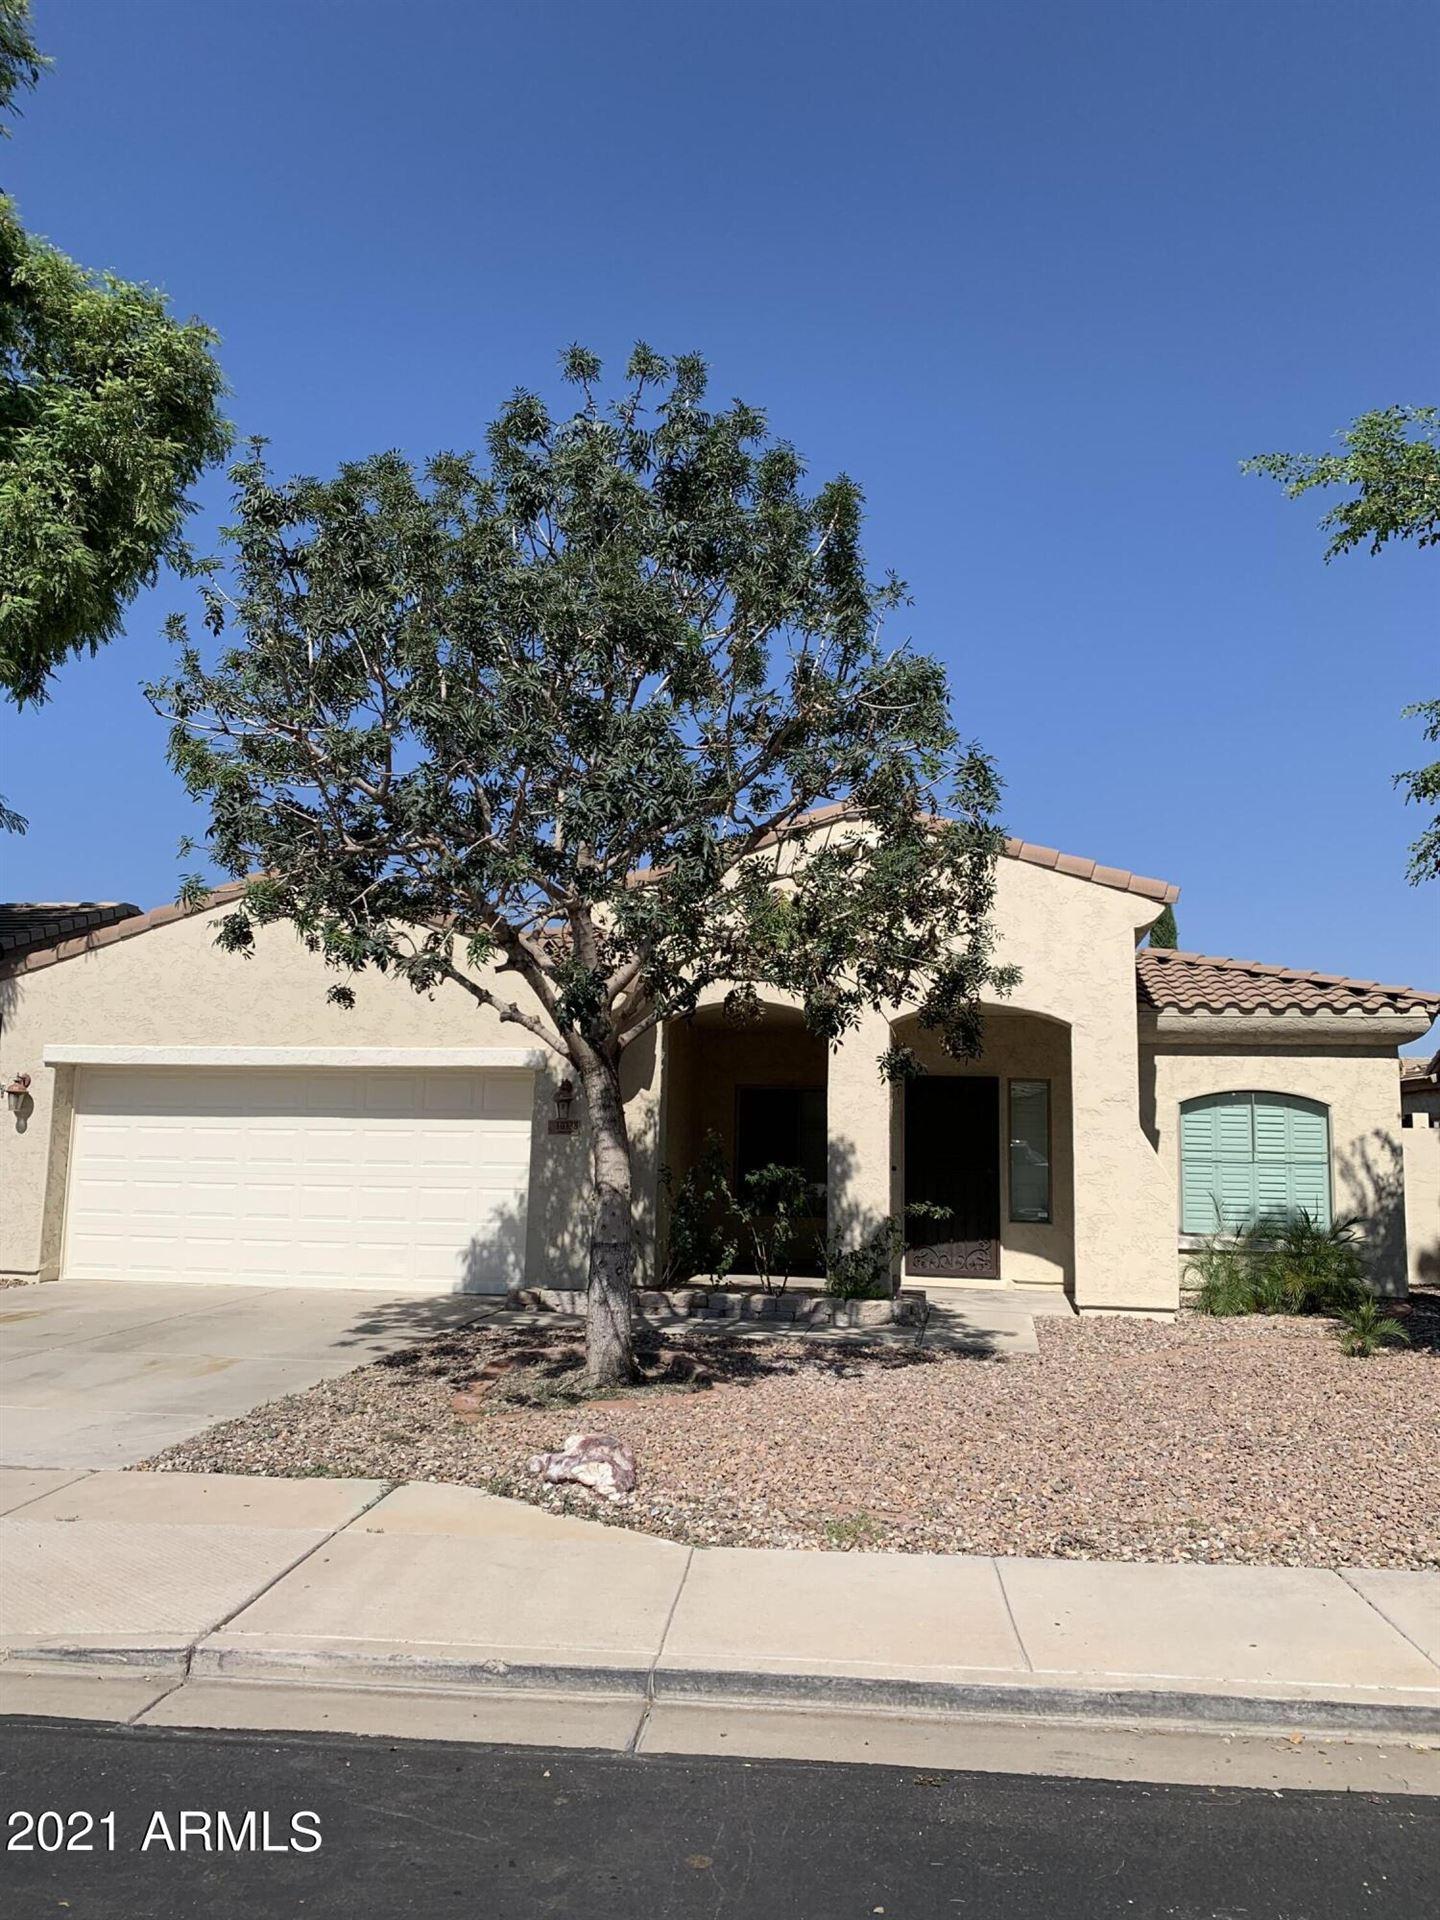 Photo of 10338 E JEROME Avenue, Mesa, AZ 85209 (MLS # 6296631)